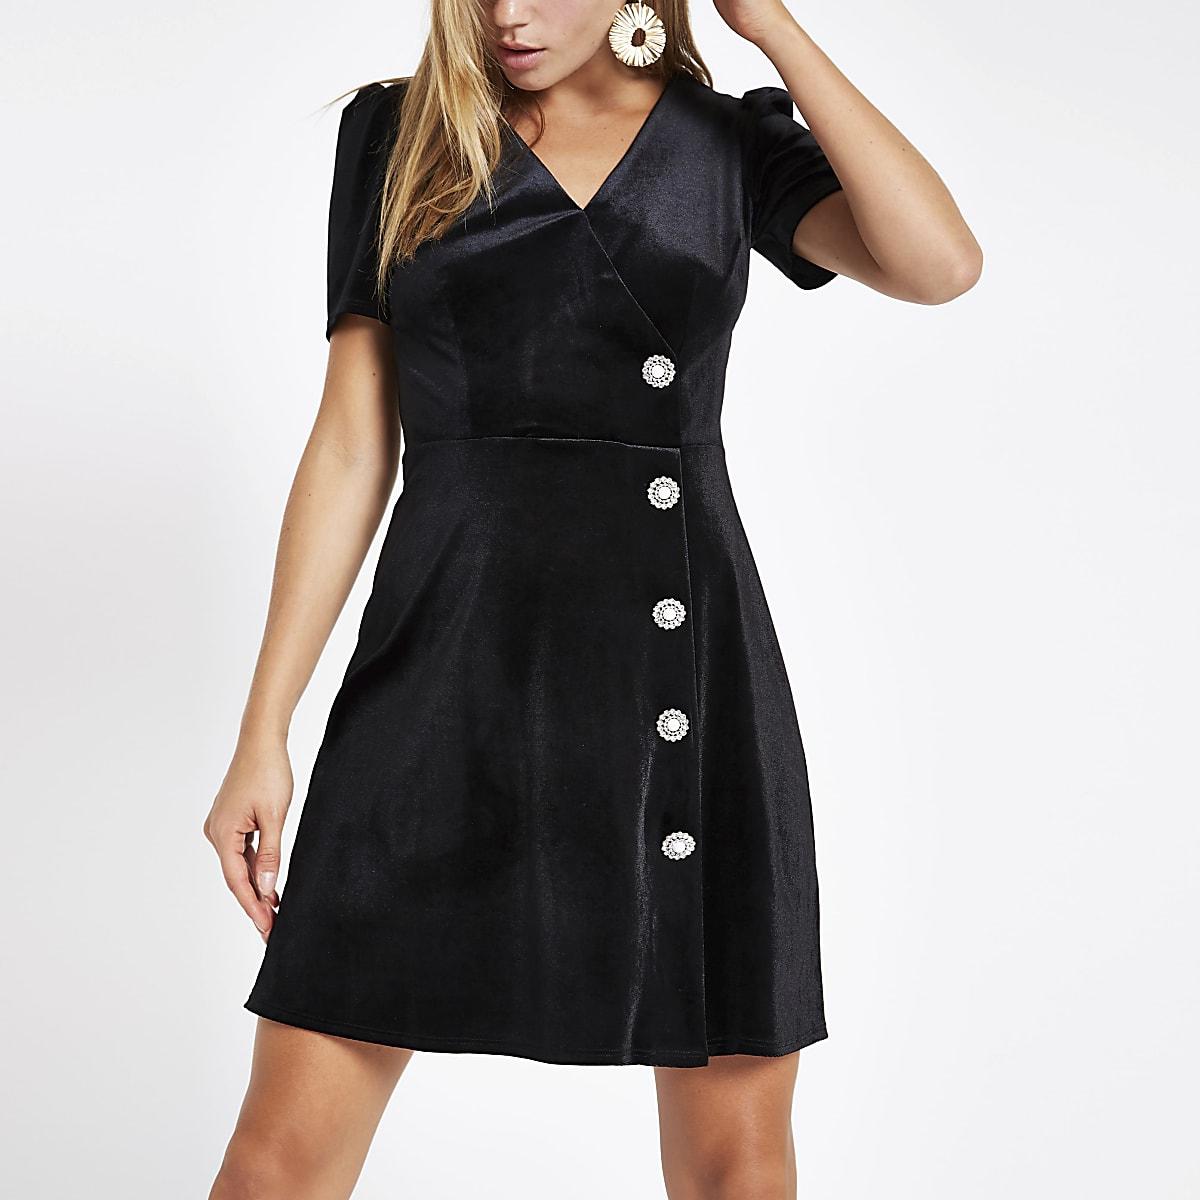 Black velvet embellished button mini dress